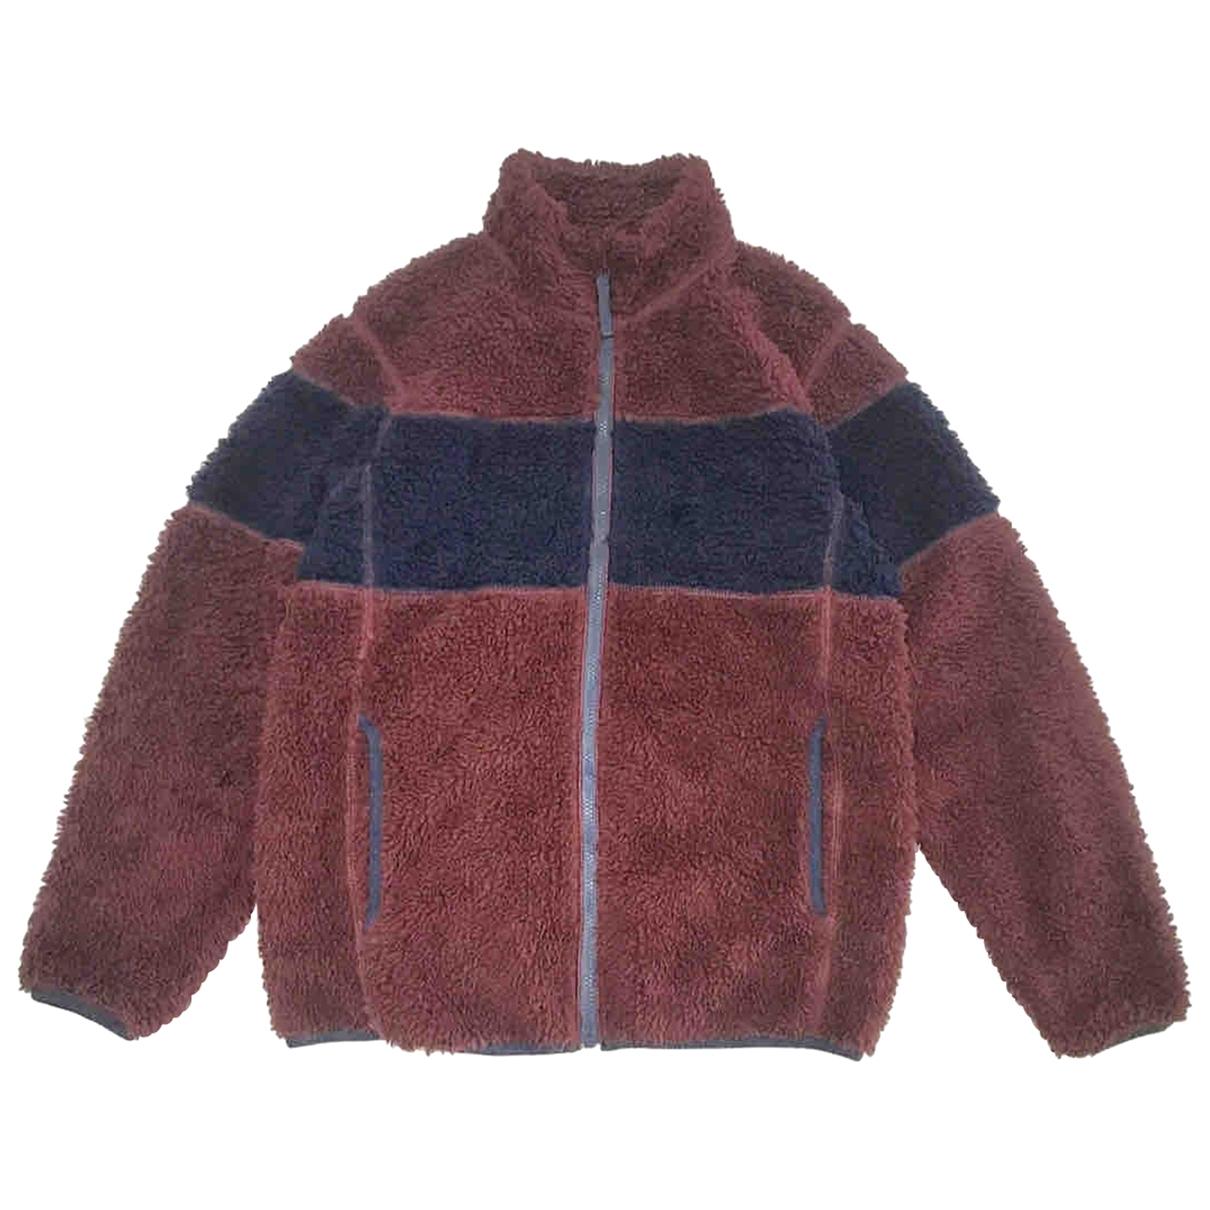 Uniqlo \N Multicolour Cotton jacket  for Men M International